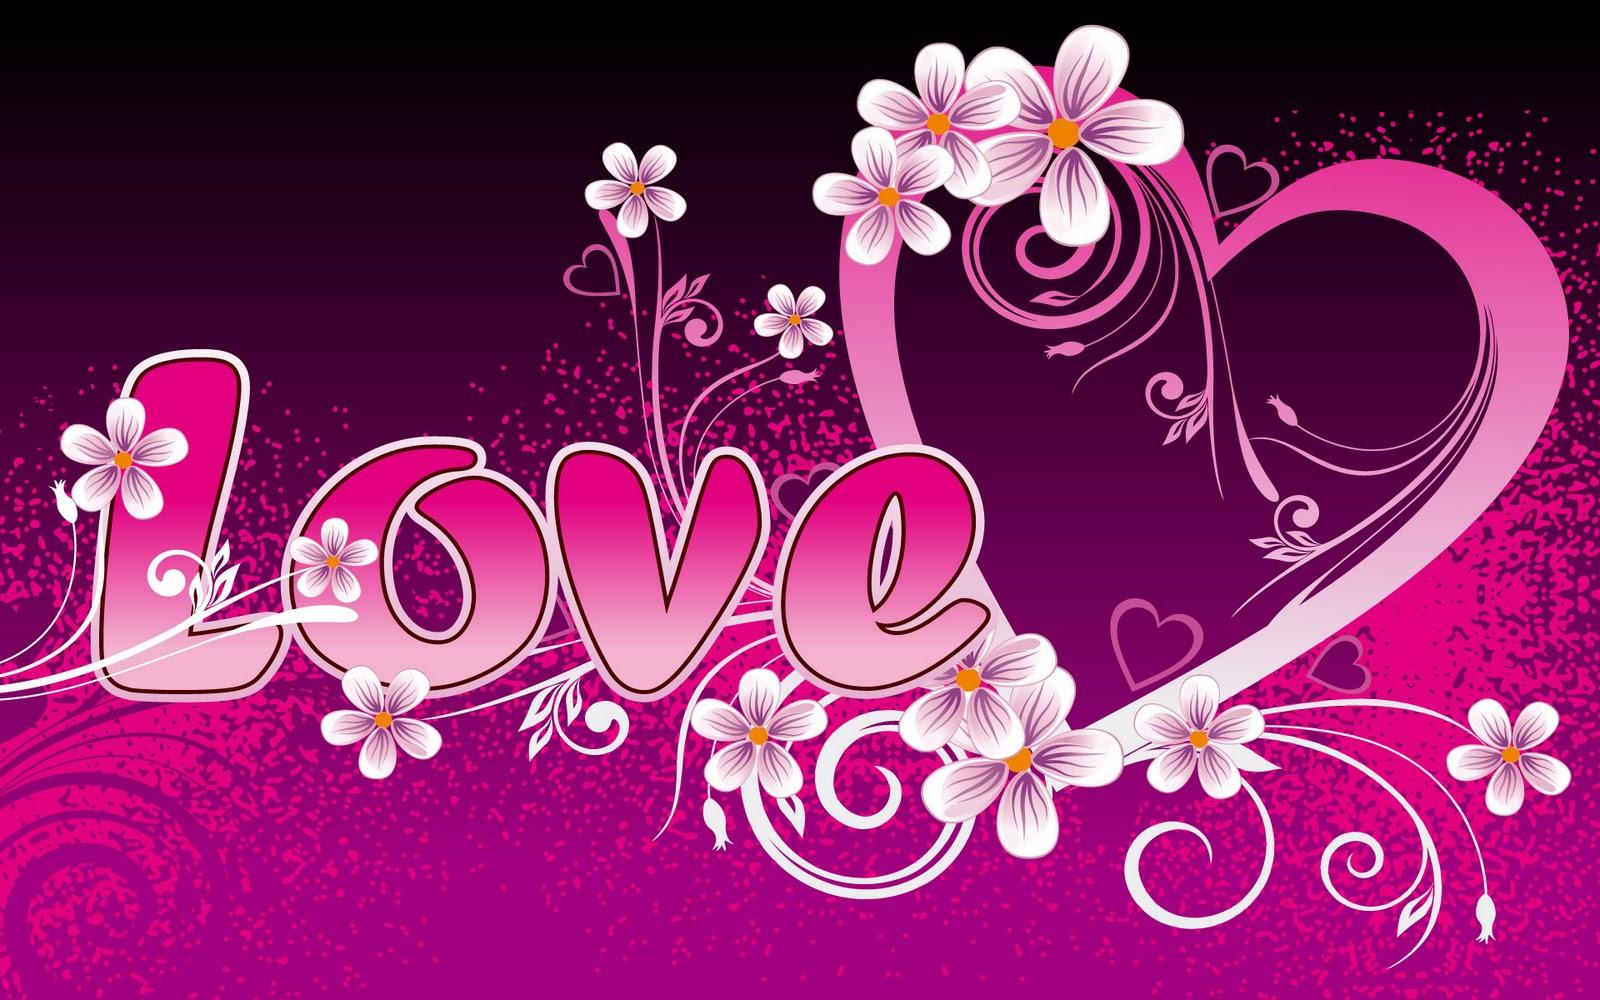 http://2.bp.blogspot.com/-XDjqx3pXYBY/TtddXyQMuLI/AAAAAAAALkg/6R6LNjy-X0k/s1600/love-heart_1920x1200_90608.jpg